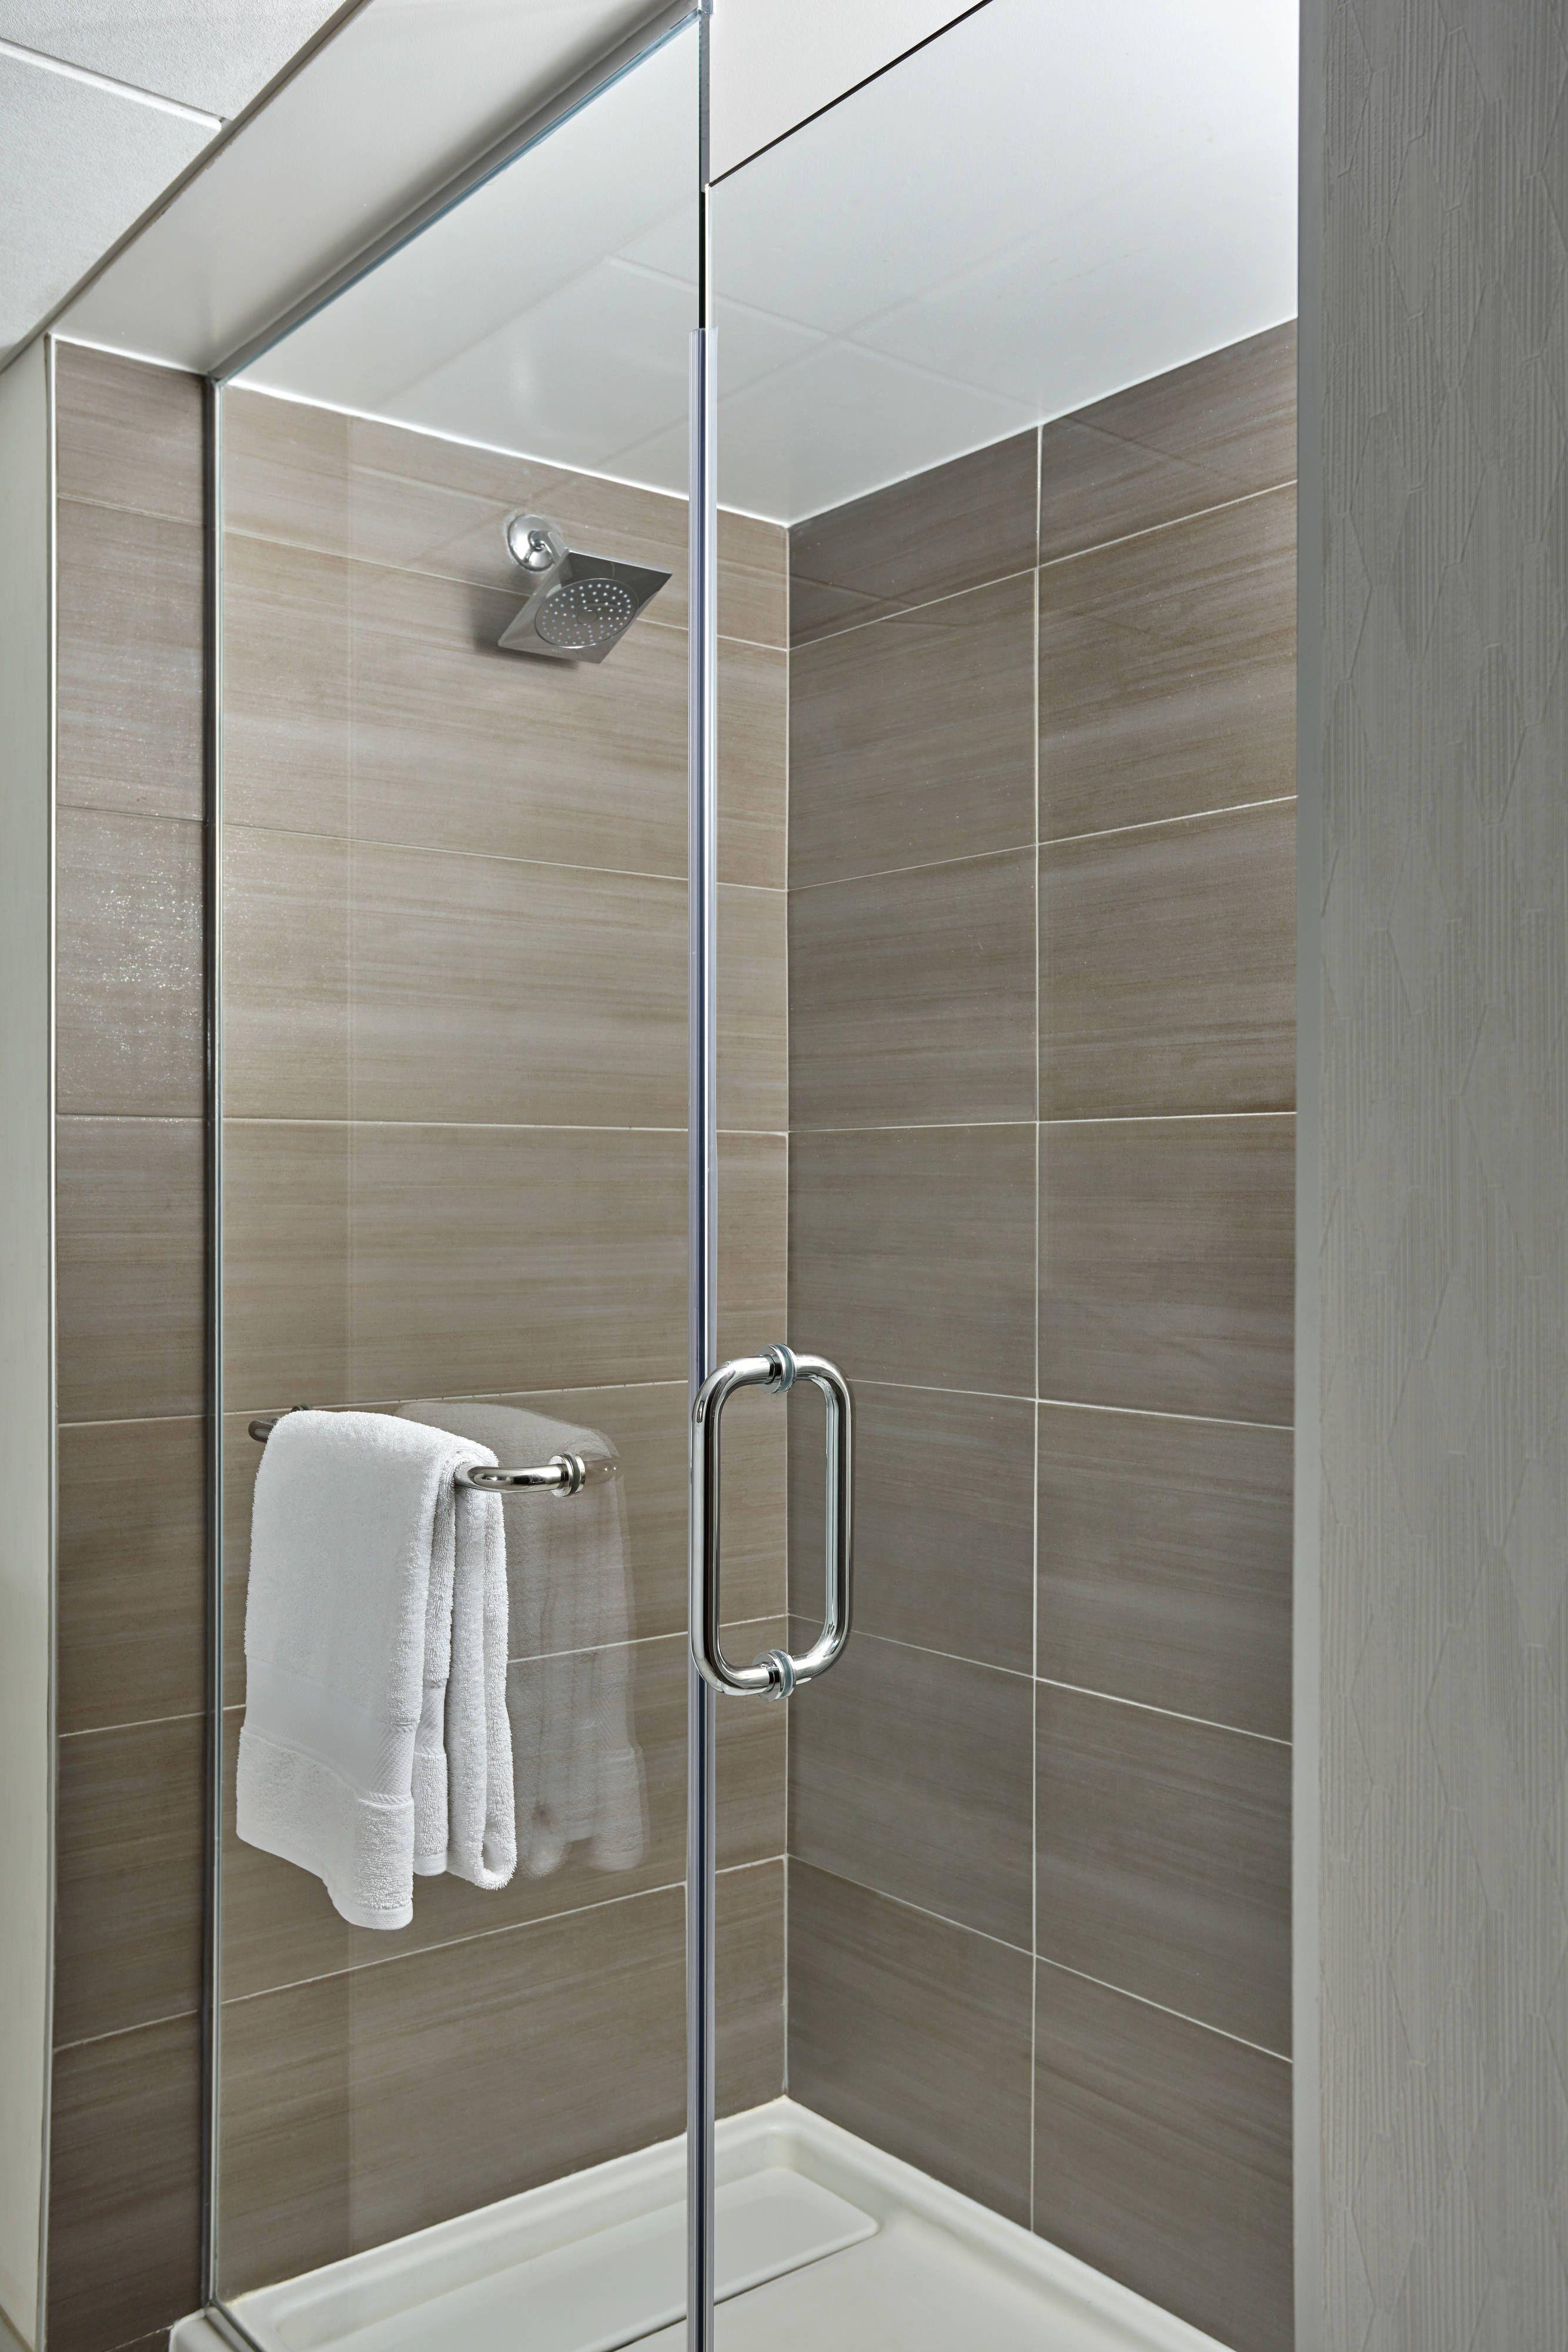 Bethesda Marriott Guest Bathroom Shower Beautiful Travel Holidays Guest Bathroom Marriott Bathroom Shower